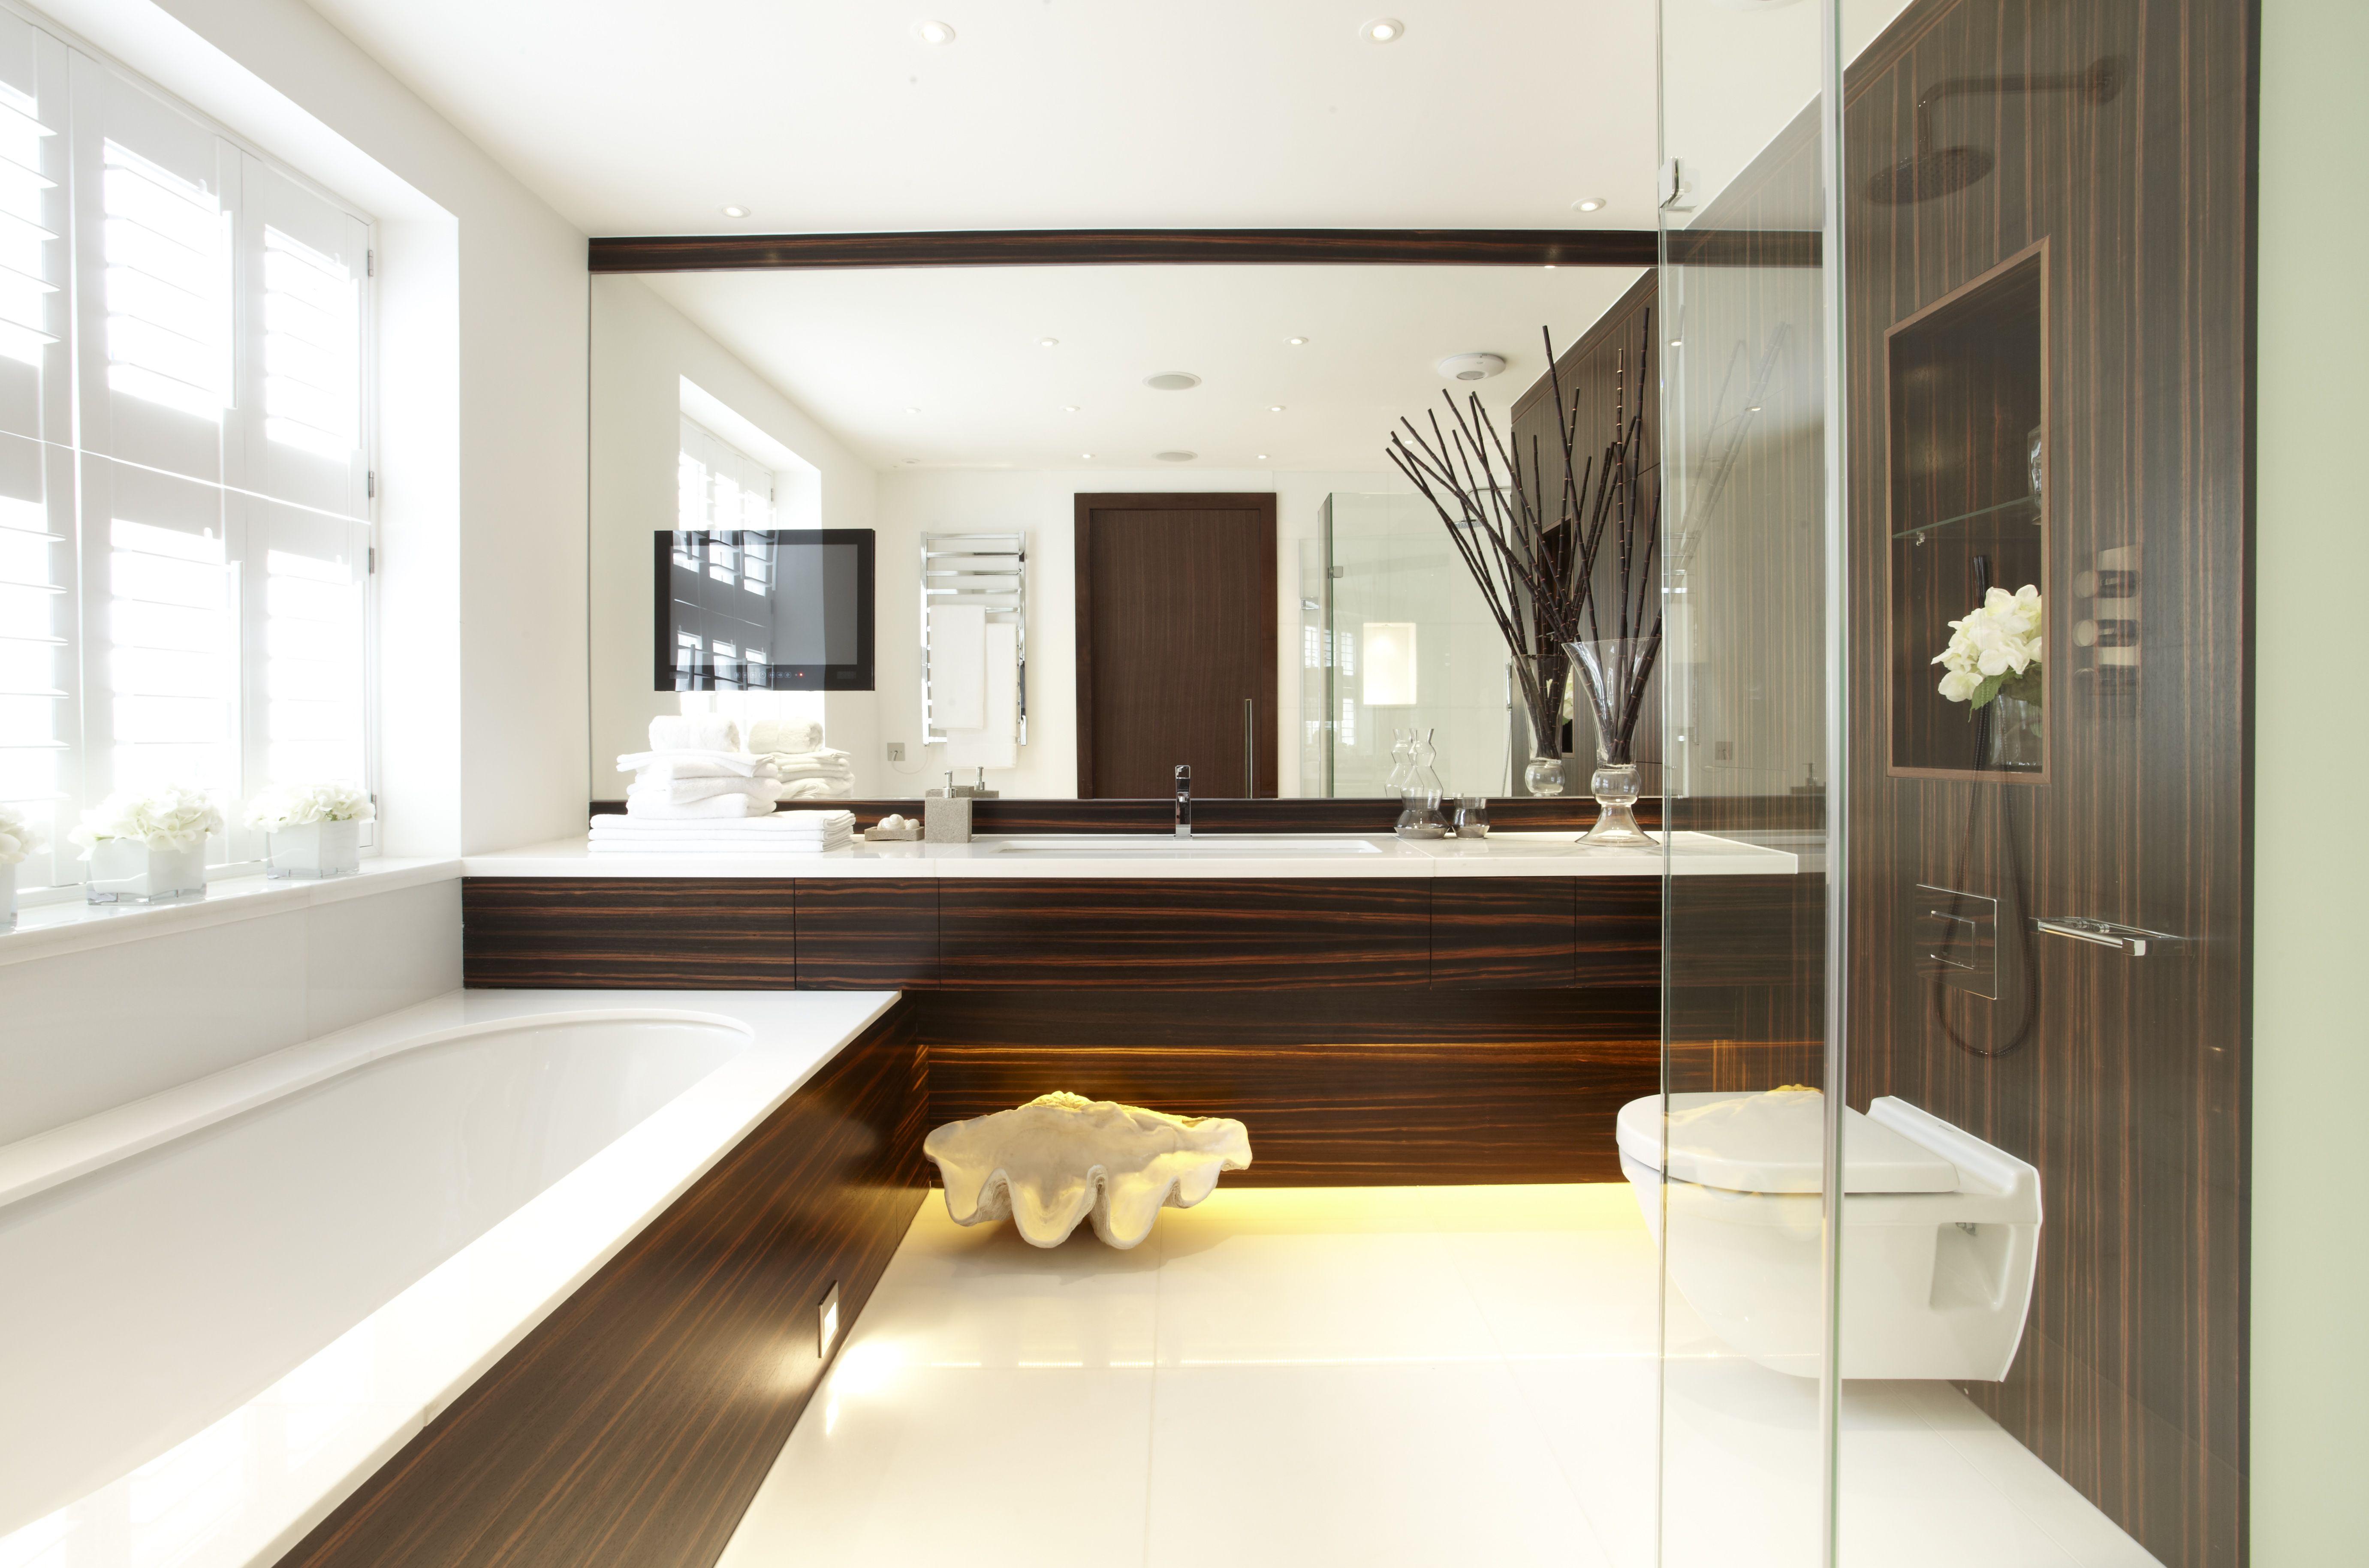 north london interior design high doors - Google Search